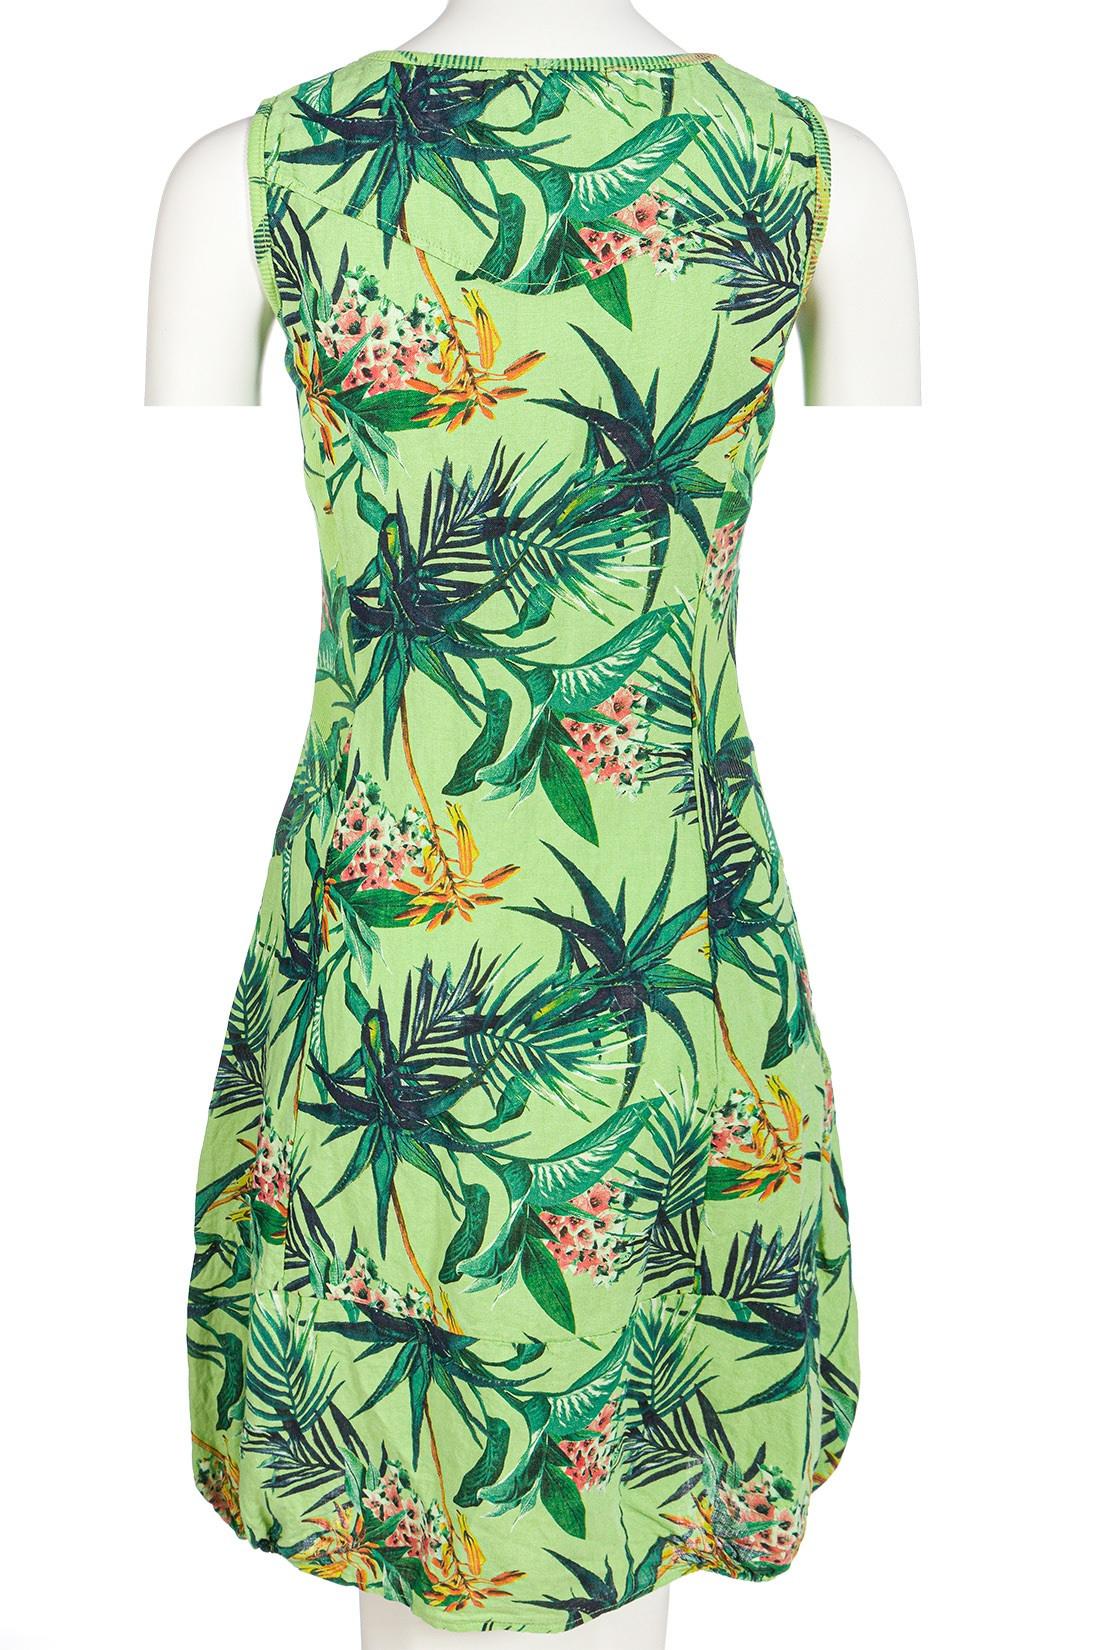 Leinenkleid Damen Tropicaldesign Sommer Knielang Lindgrün 40